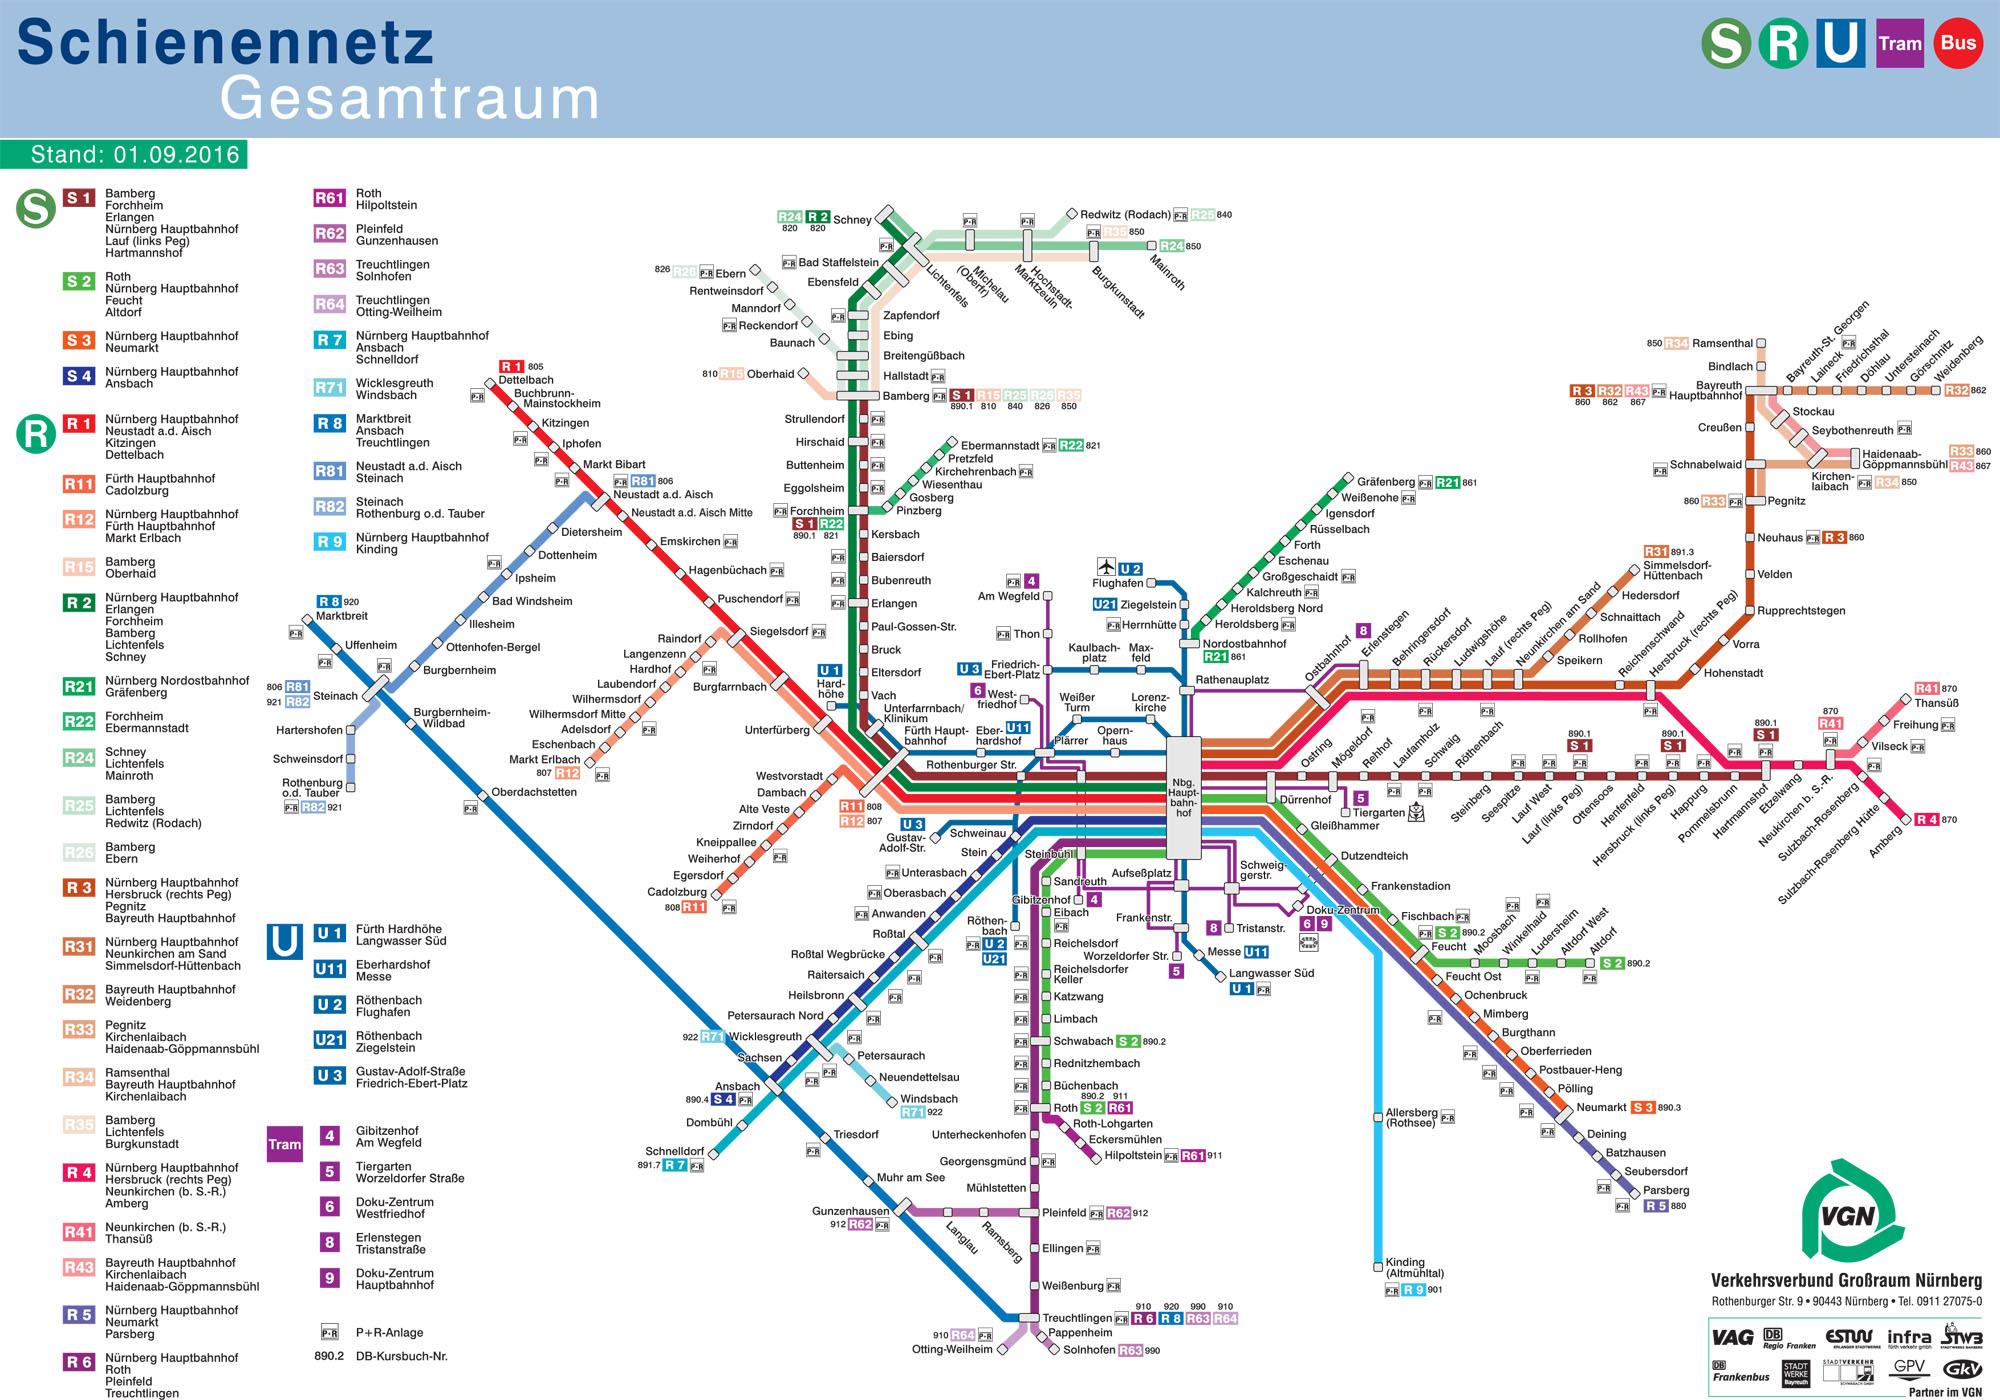 Hamburg Hauptbahnhof Karte.Top 10 Punto Medio Noticias Fahrplan Metronom Buxtehude Hamburg Hbf